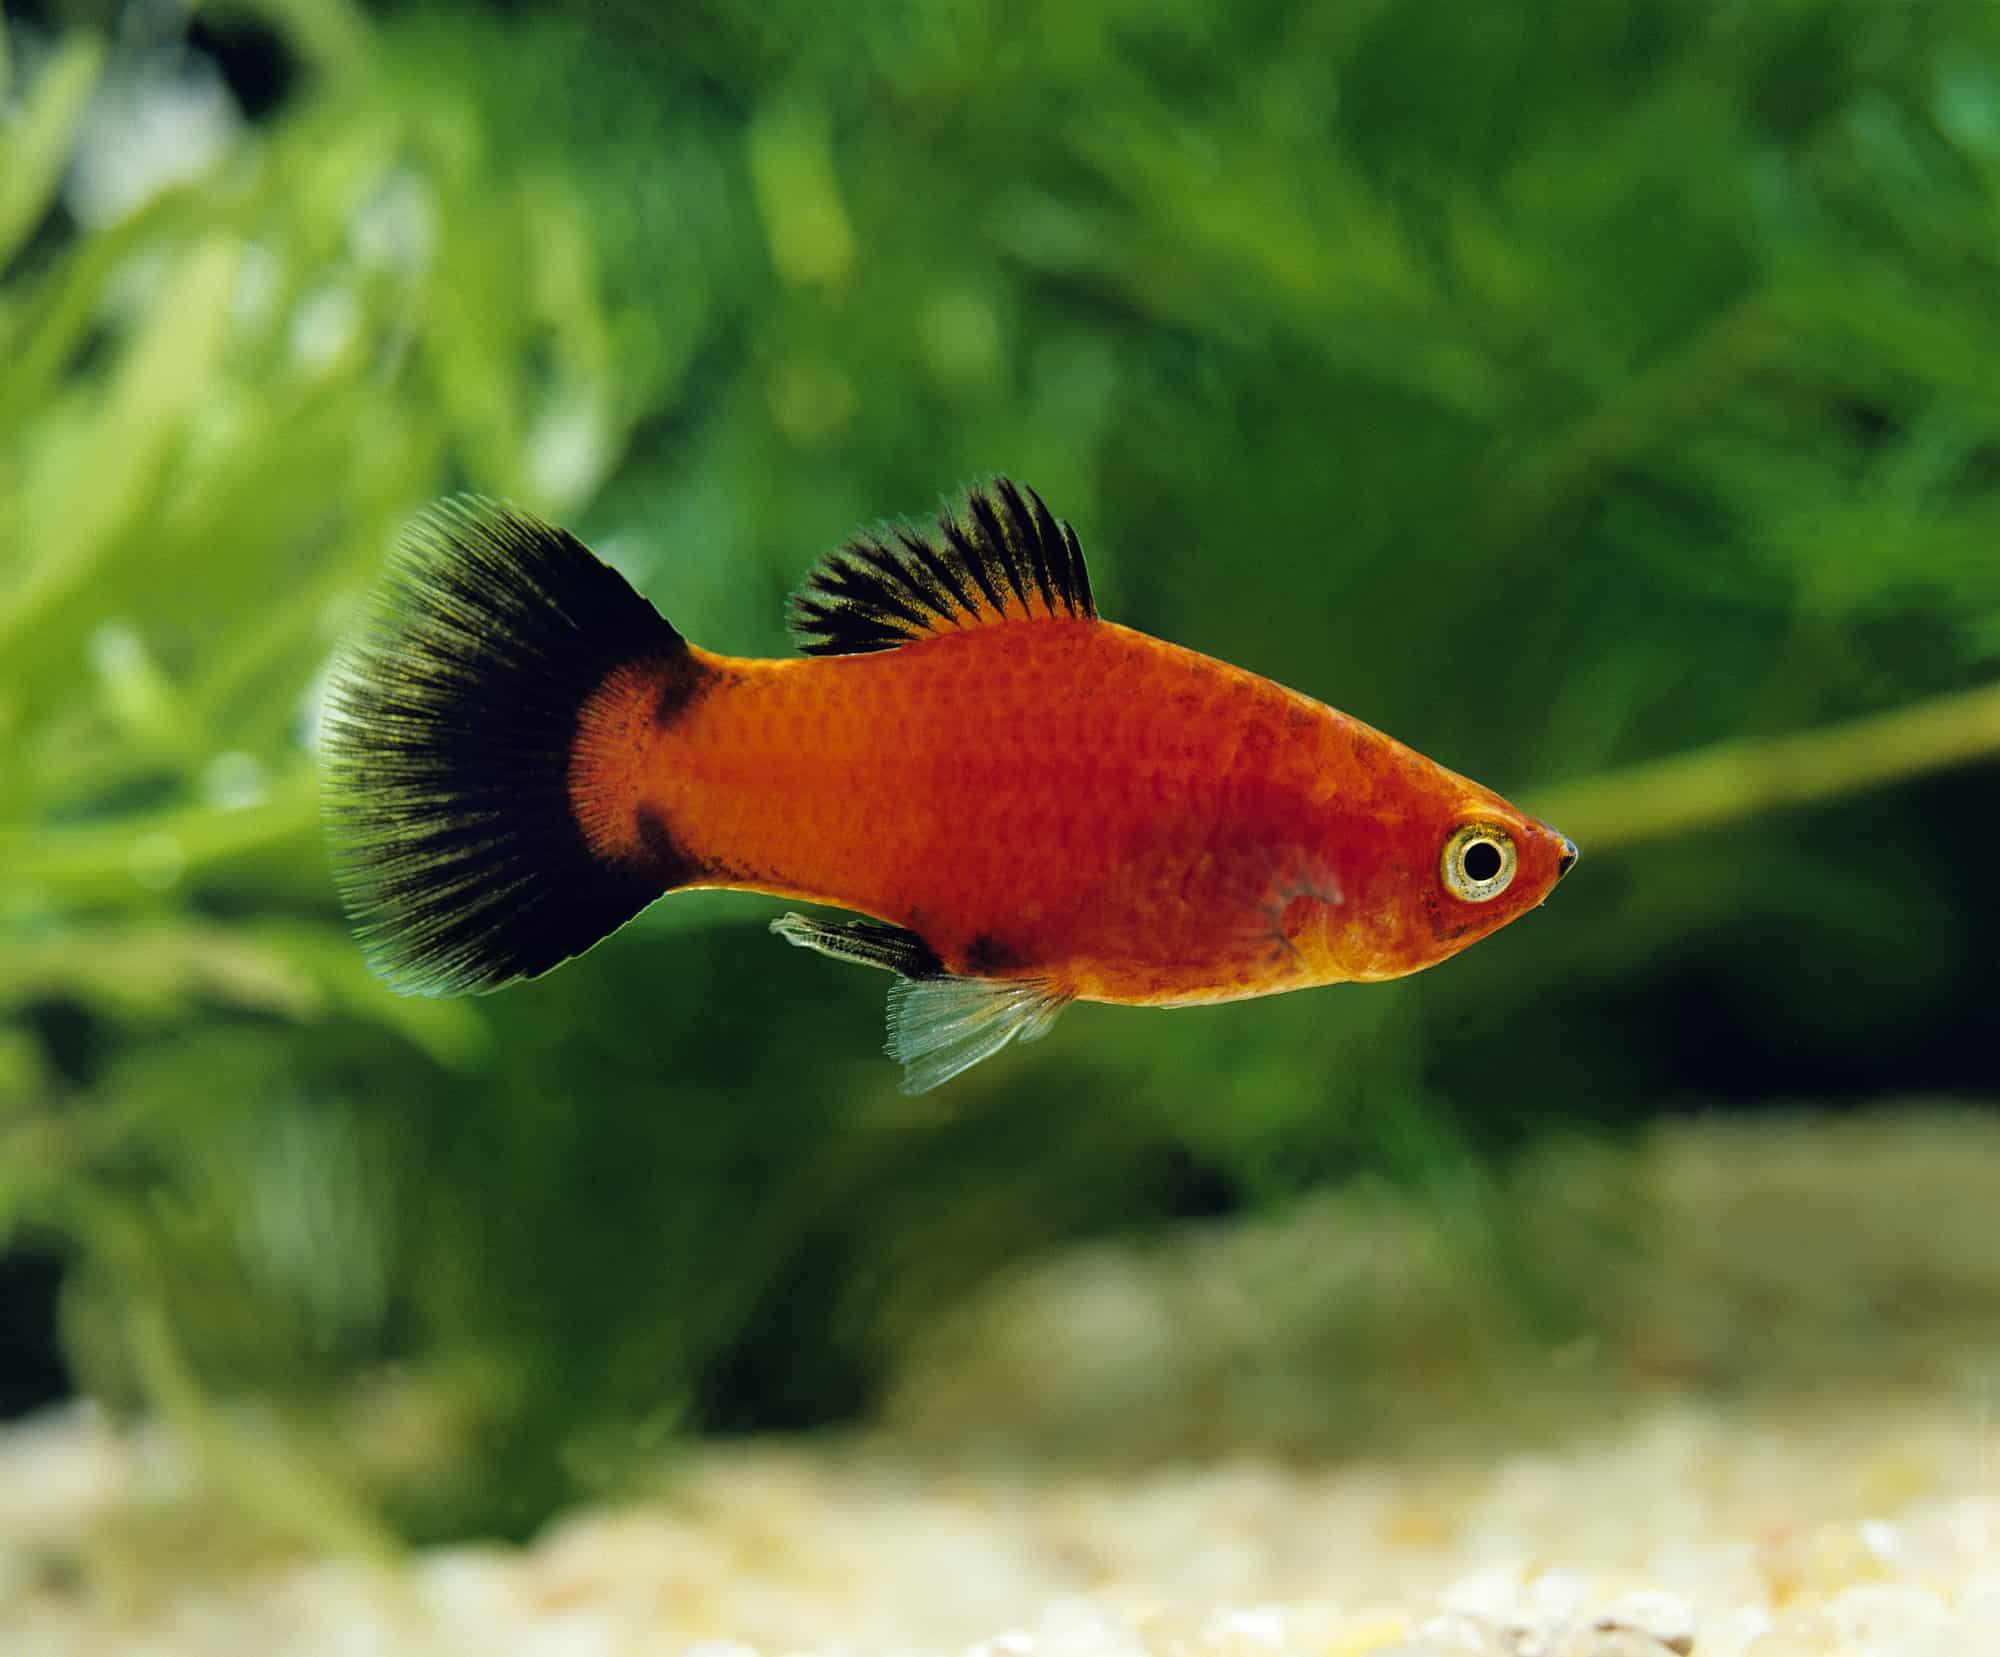 Wagtail Platy Fish, xiphophorus maculatus